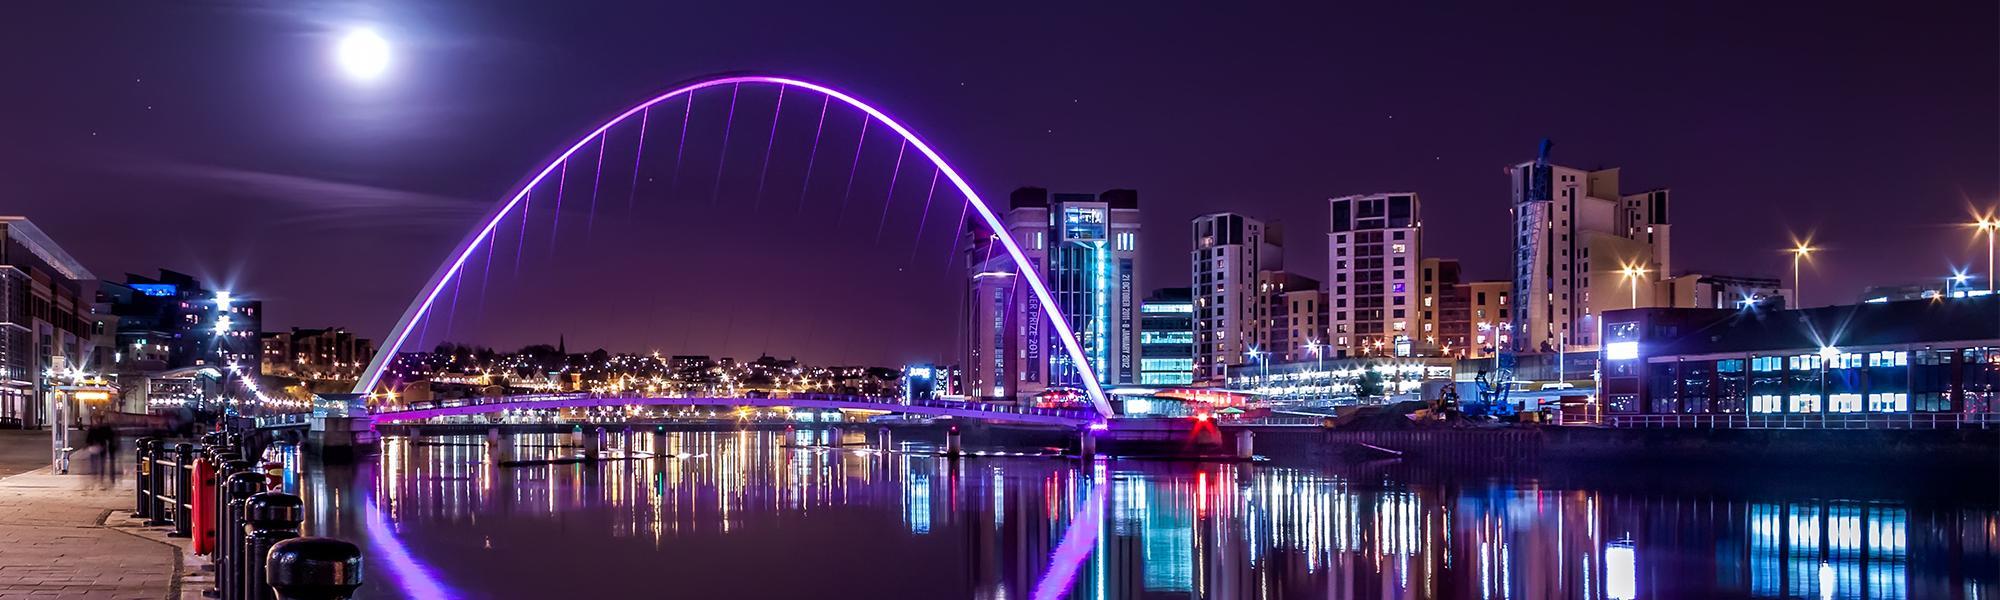 Gateshead Millennium Bridge header - purple